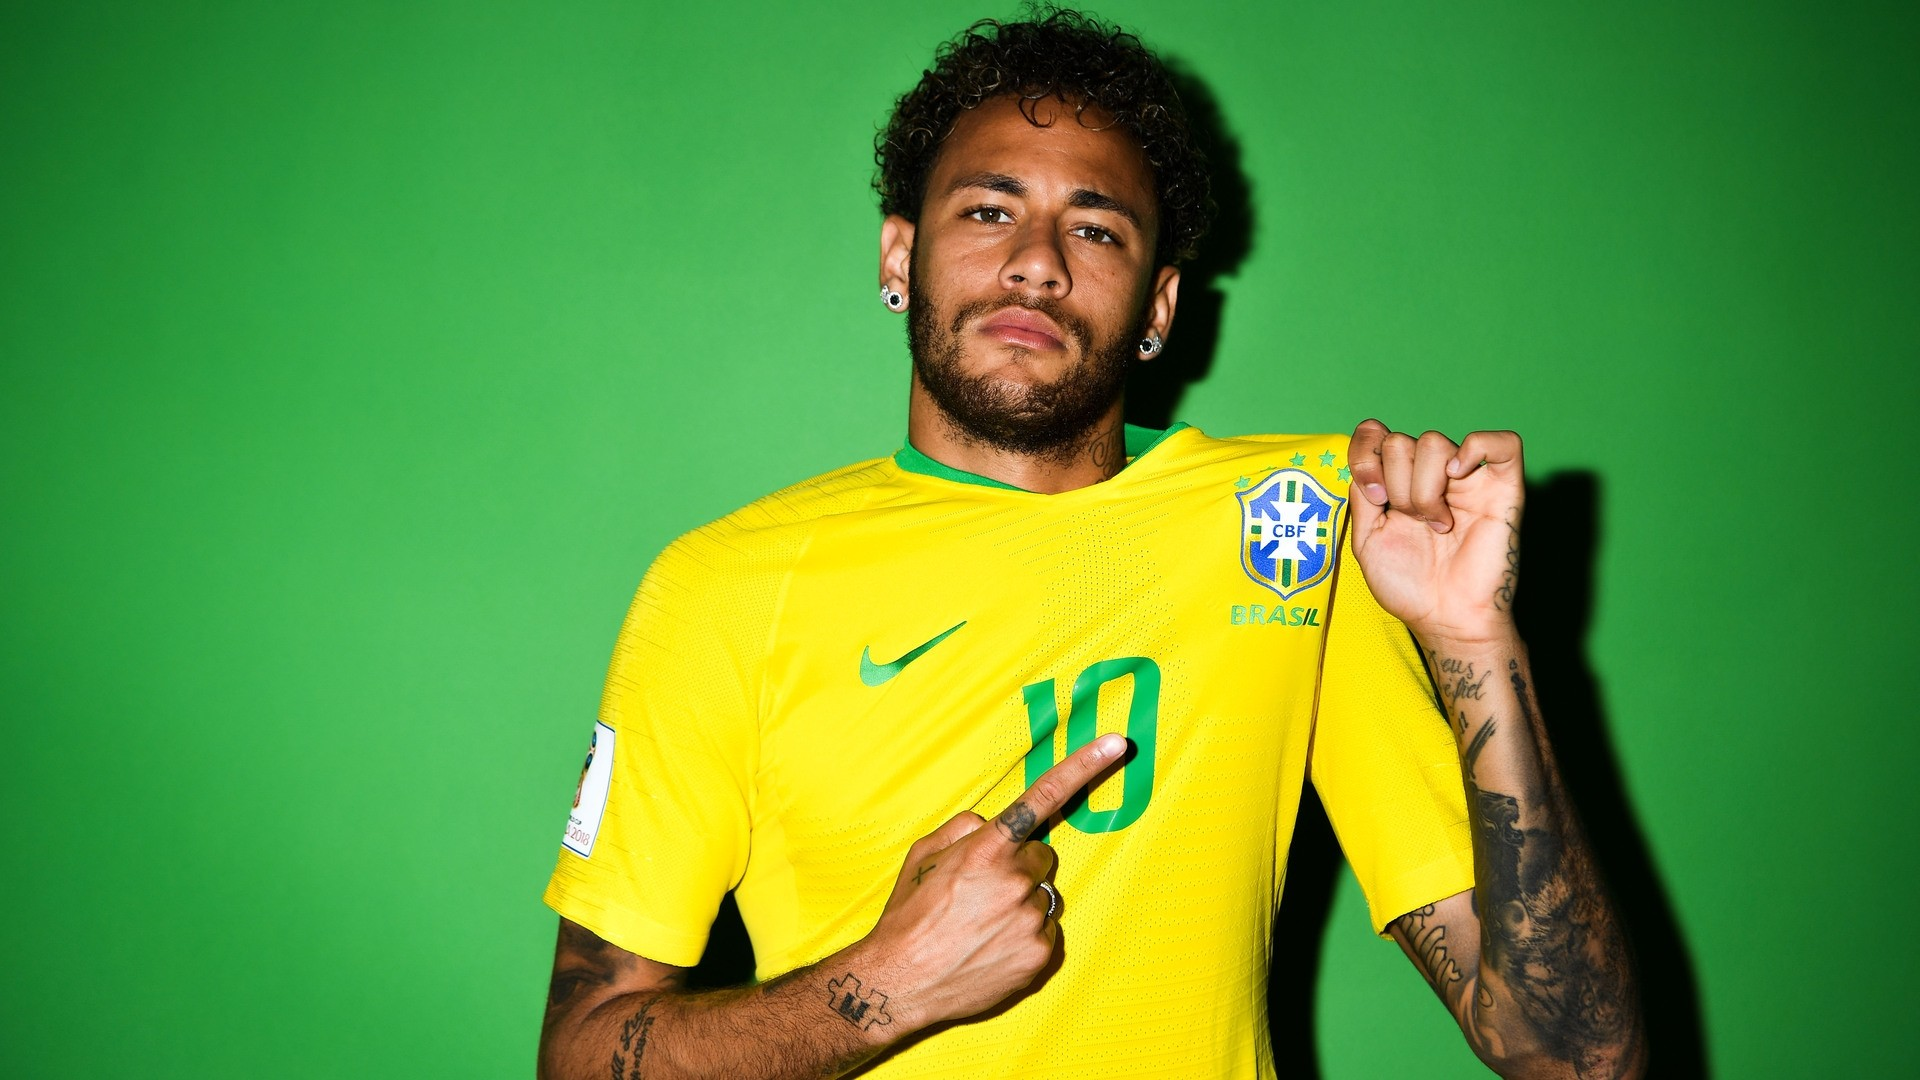 Neymar Jr Background